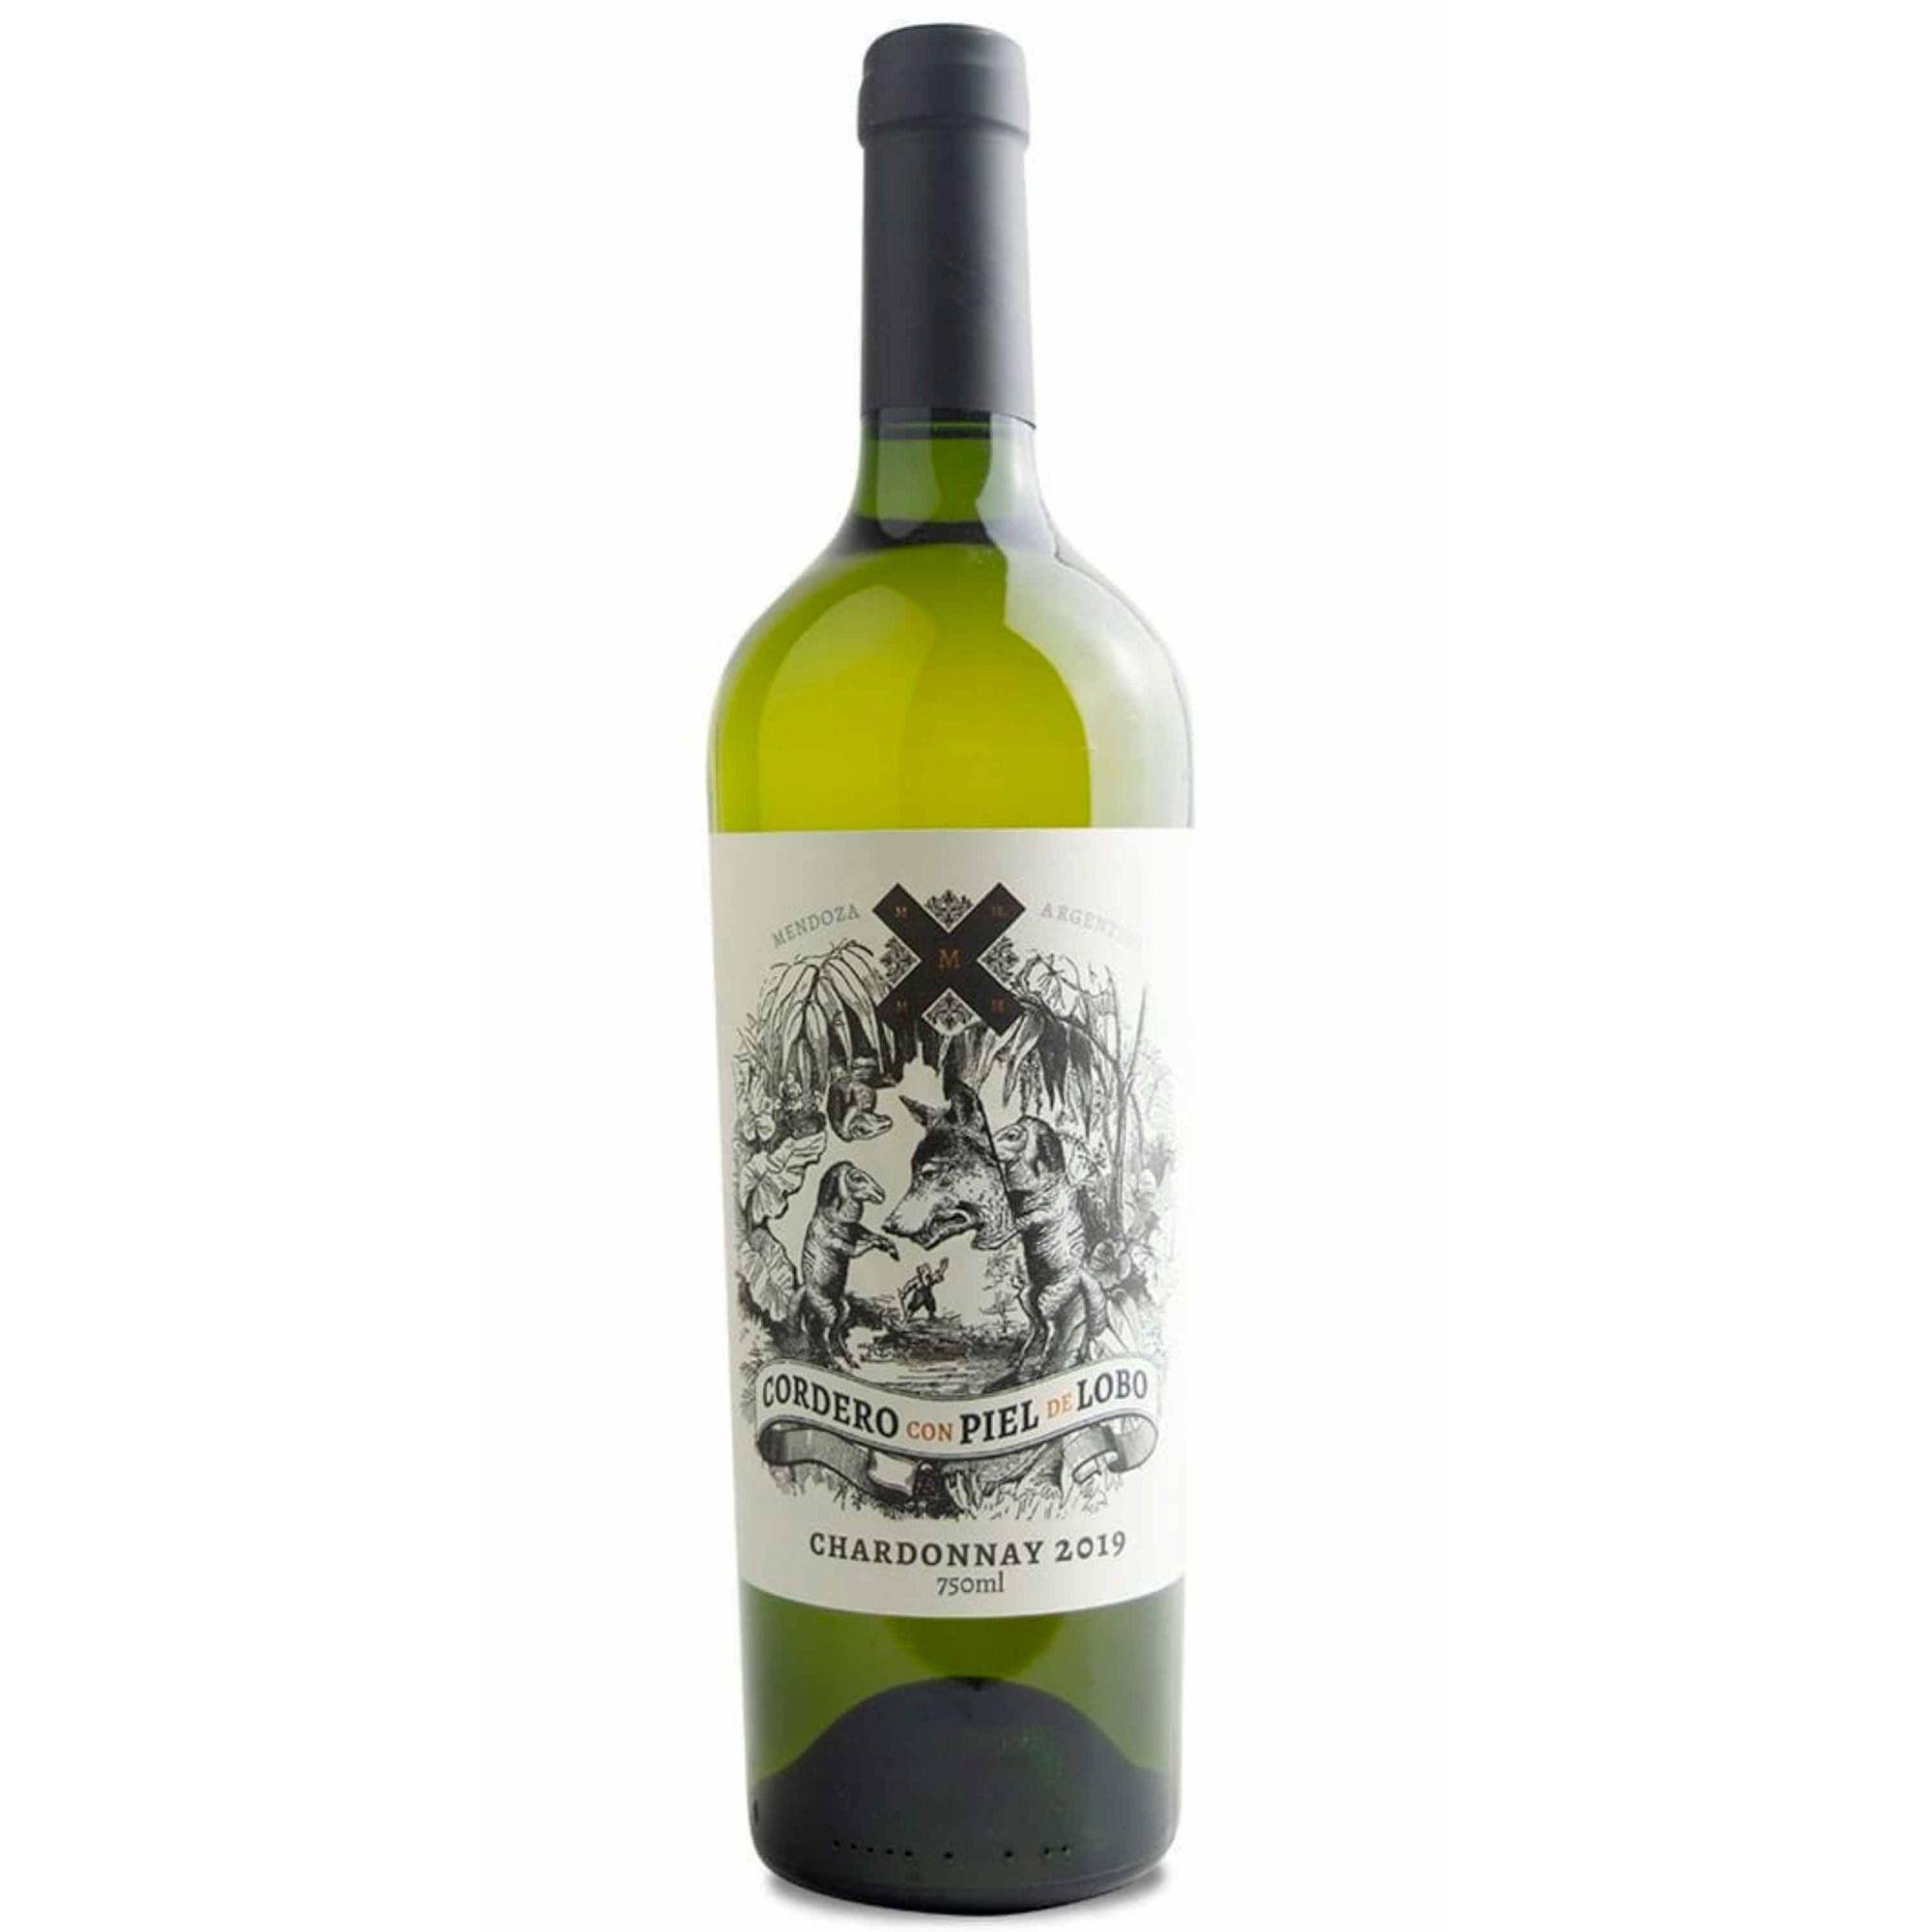 Cordero Con Piel de Lobo Chardonnay